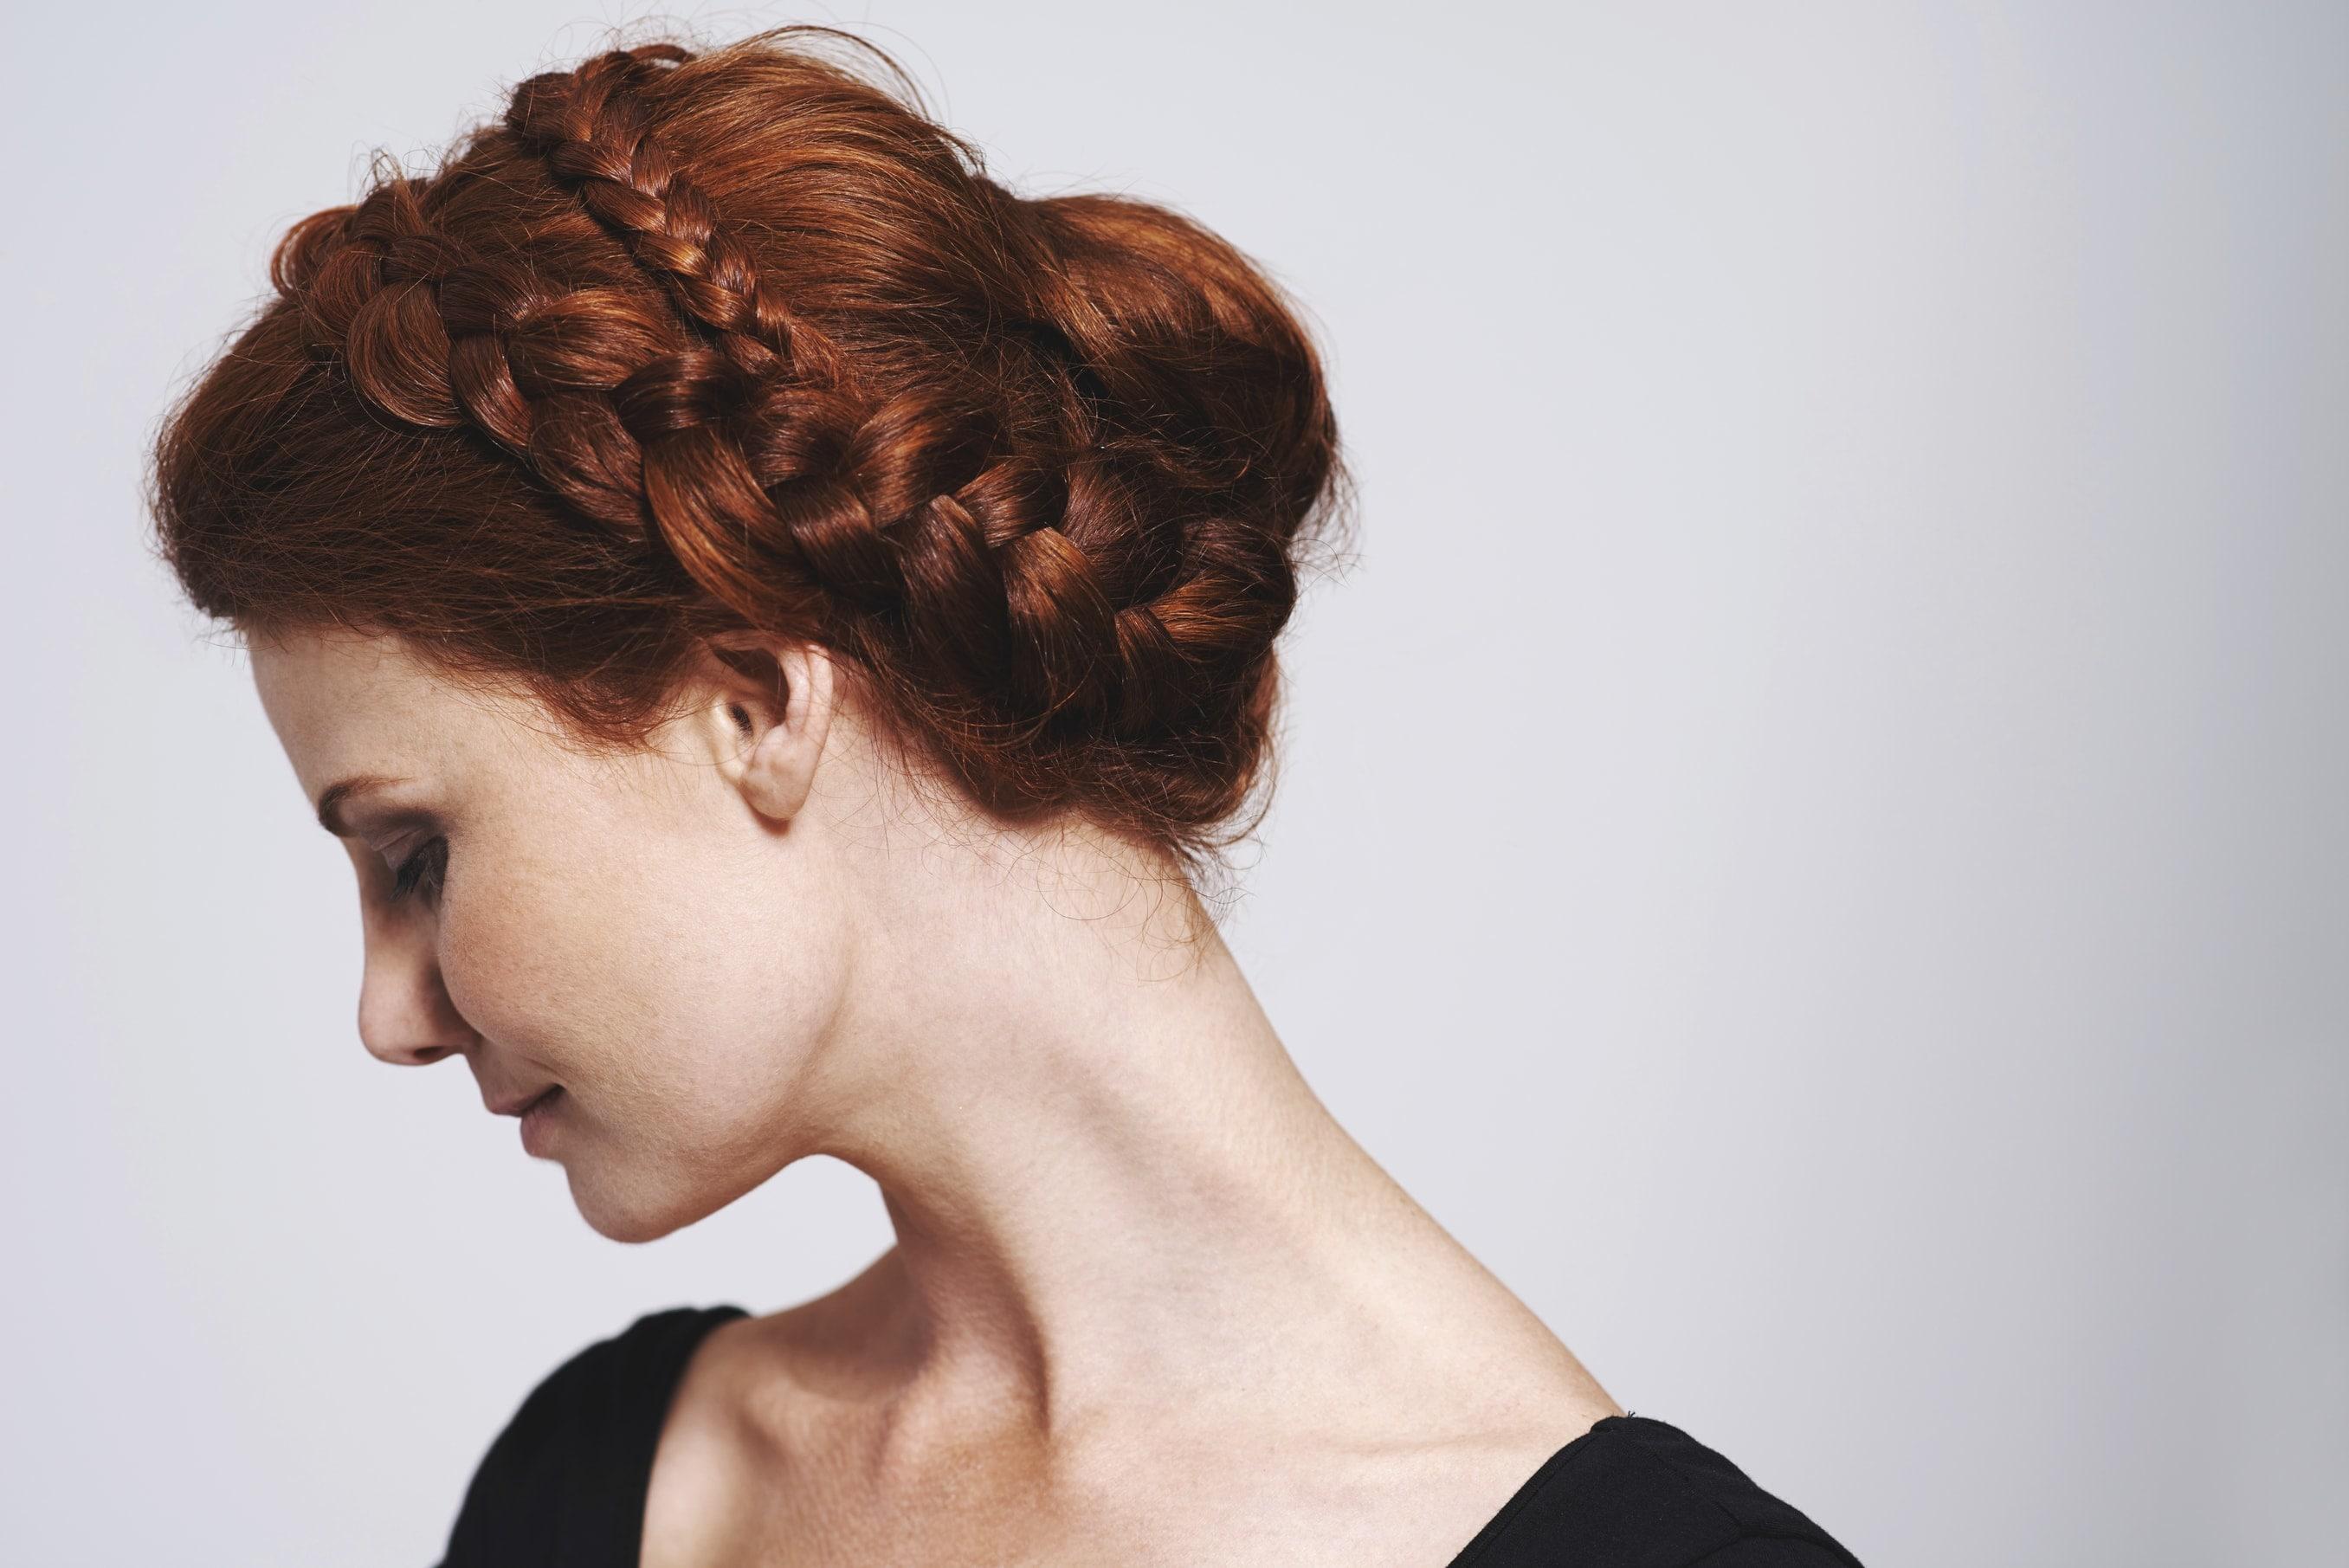 hair bun styles: red head woman with hair styled in a braided headband bun hairstyle